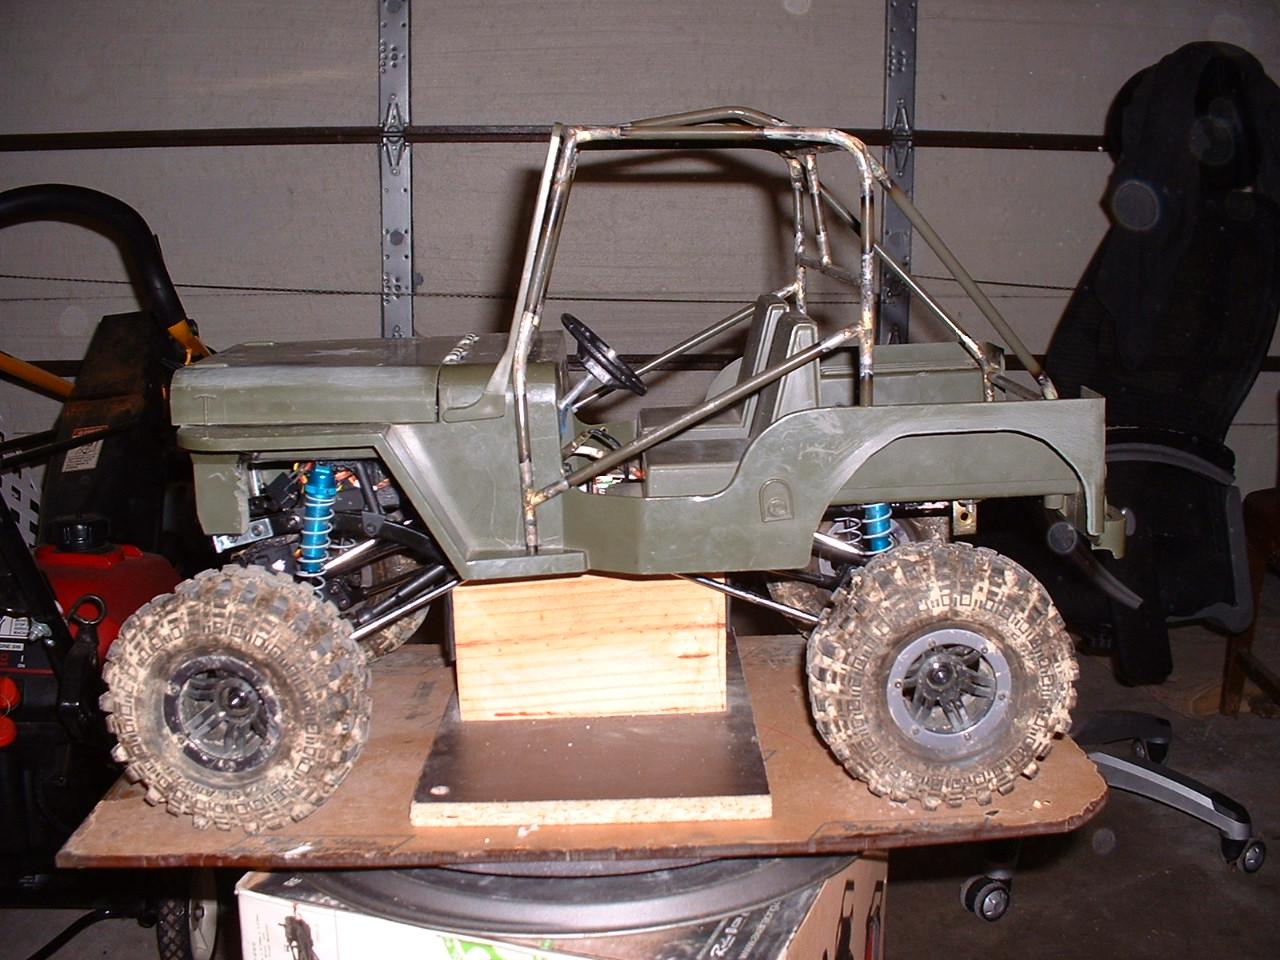 Click image for larger version  Name:GI Joe Jeep 6a 003.JPG Views:973 Size:324.2 KB ID:2041221